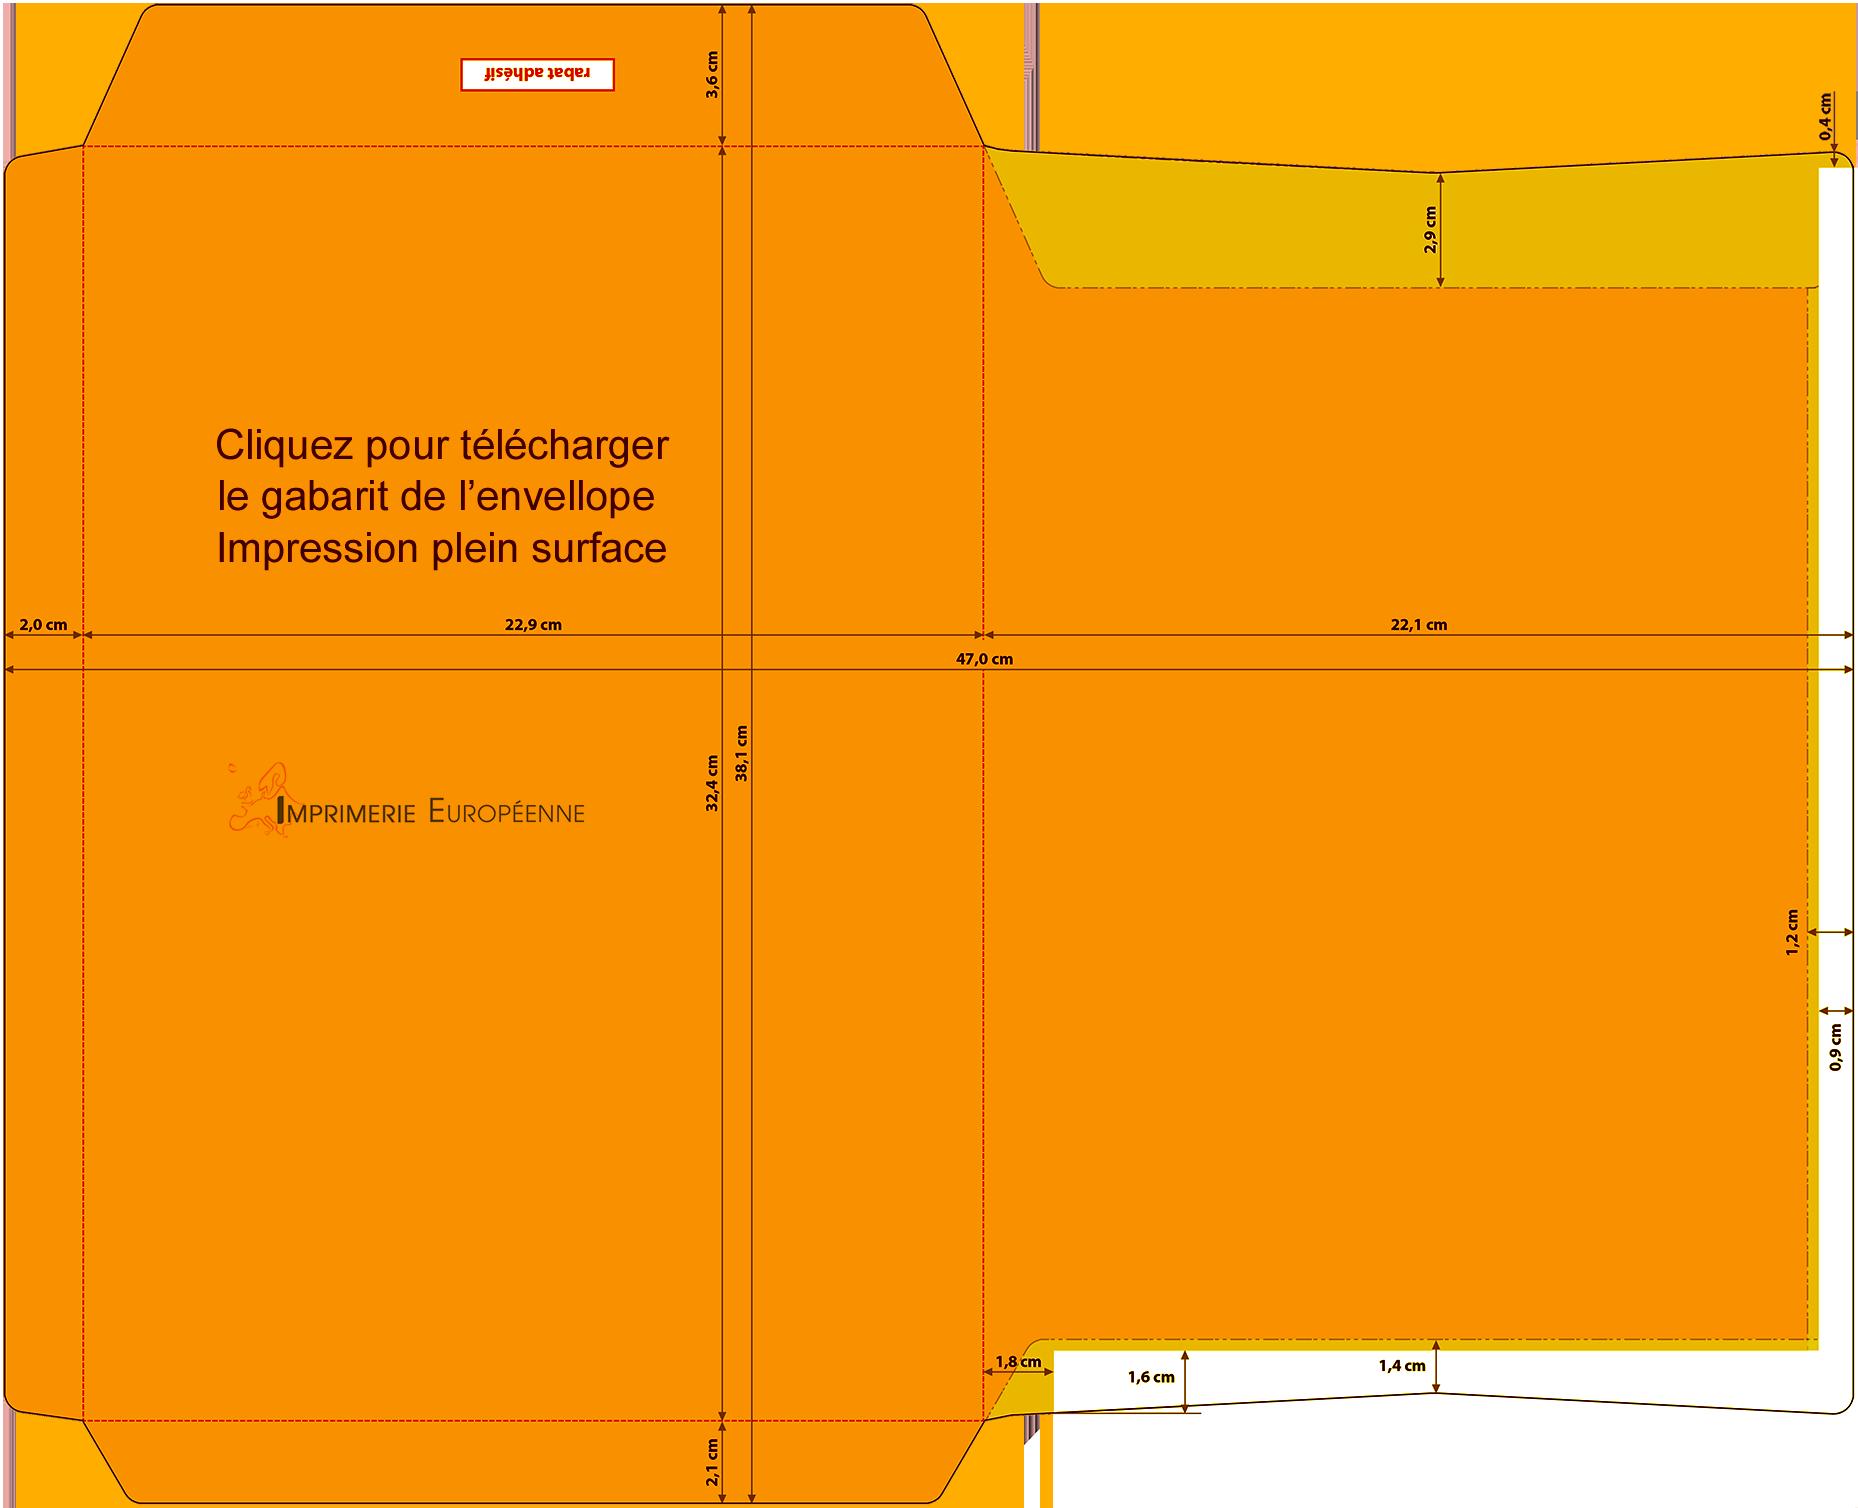 Enveloppe c4 90g impression quadri pleine surface r f3 for Enveloppe c4 avec fenetre